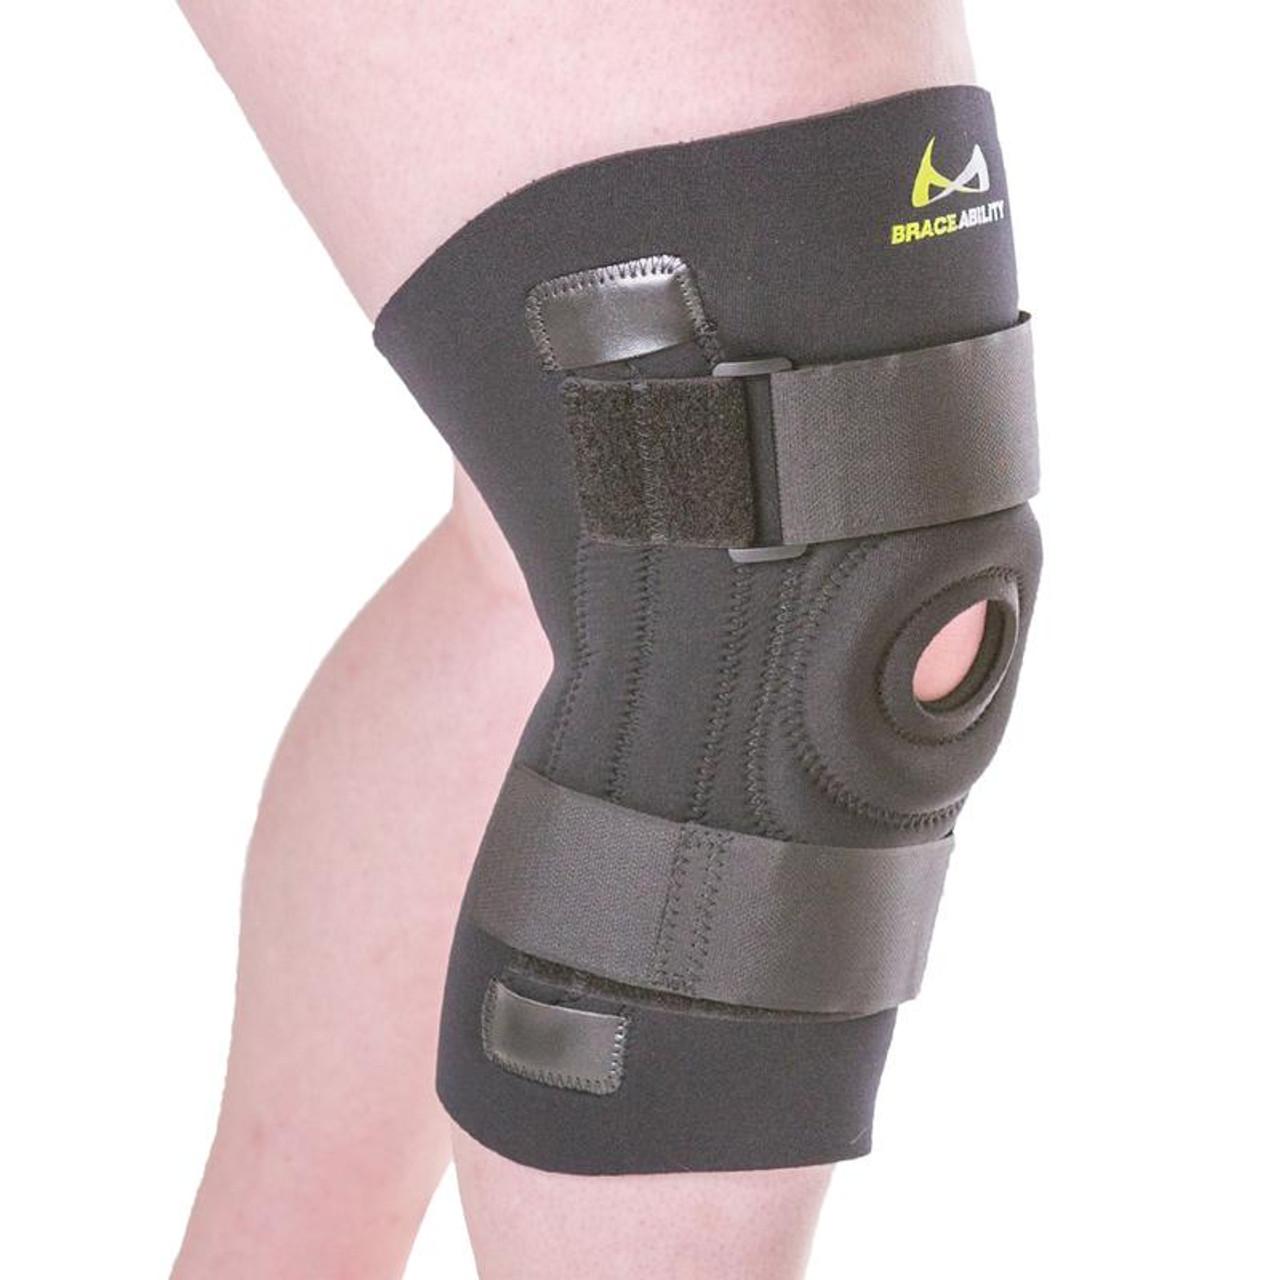 66e97ad20f Knee Brace, Large